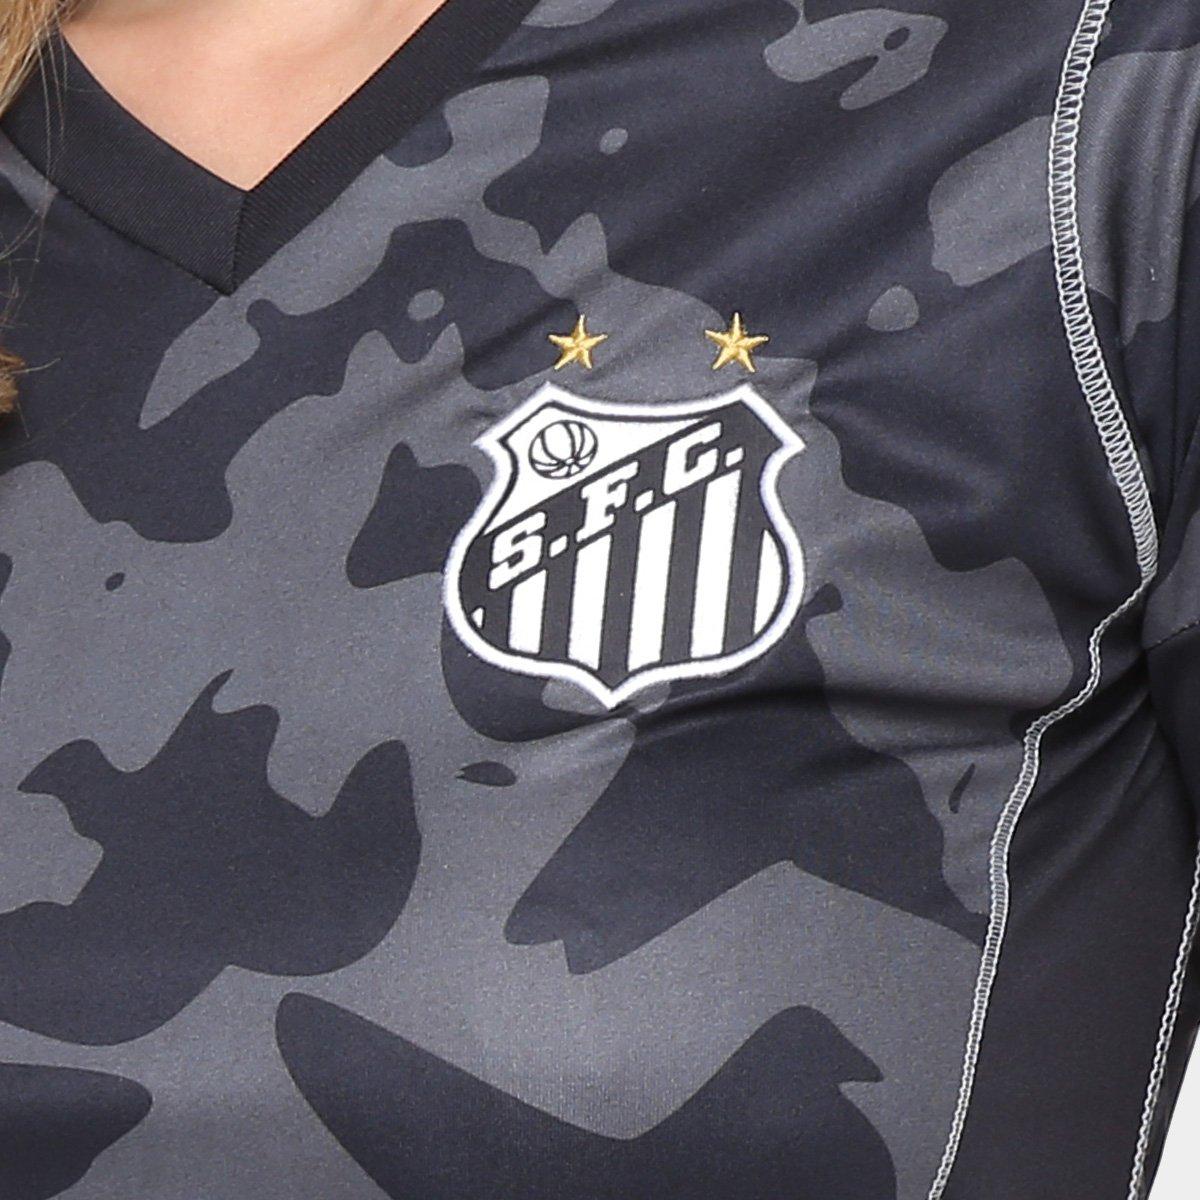 n° Camisa Feminina s 18 17 Preto Santos Torcedor Kappa III rqwCXxPq